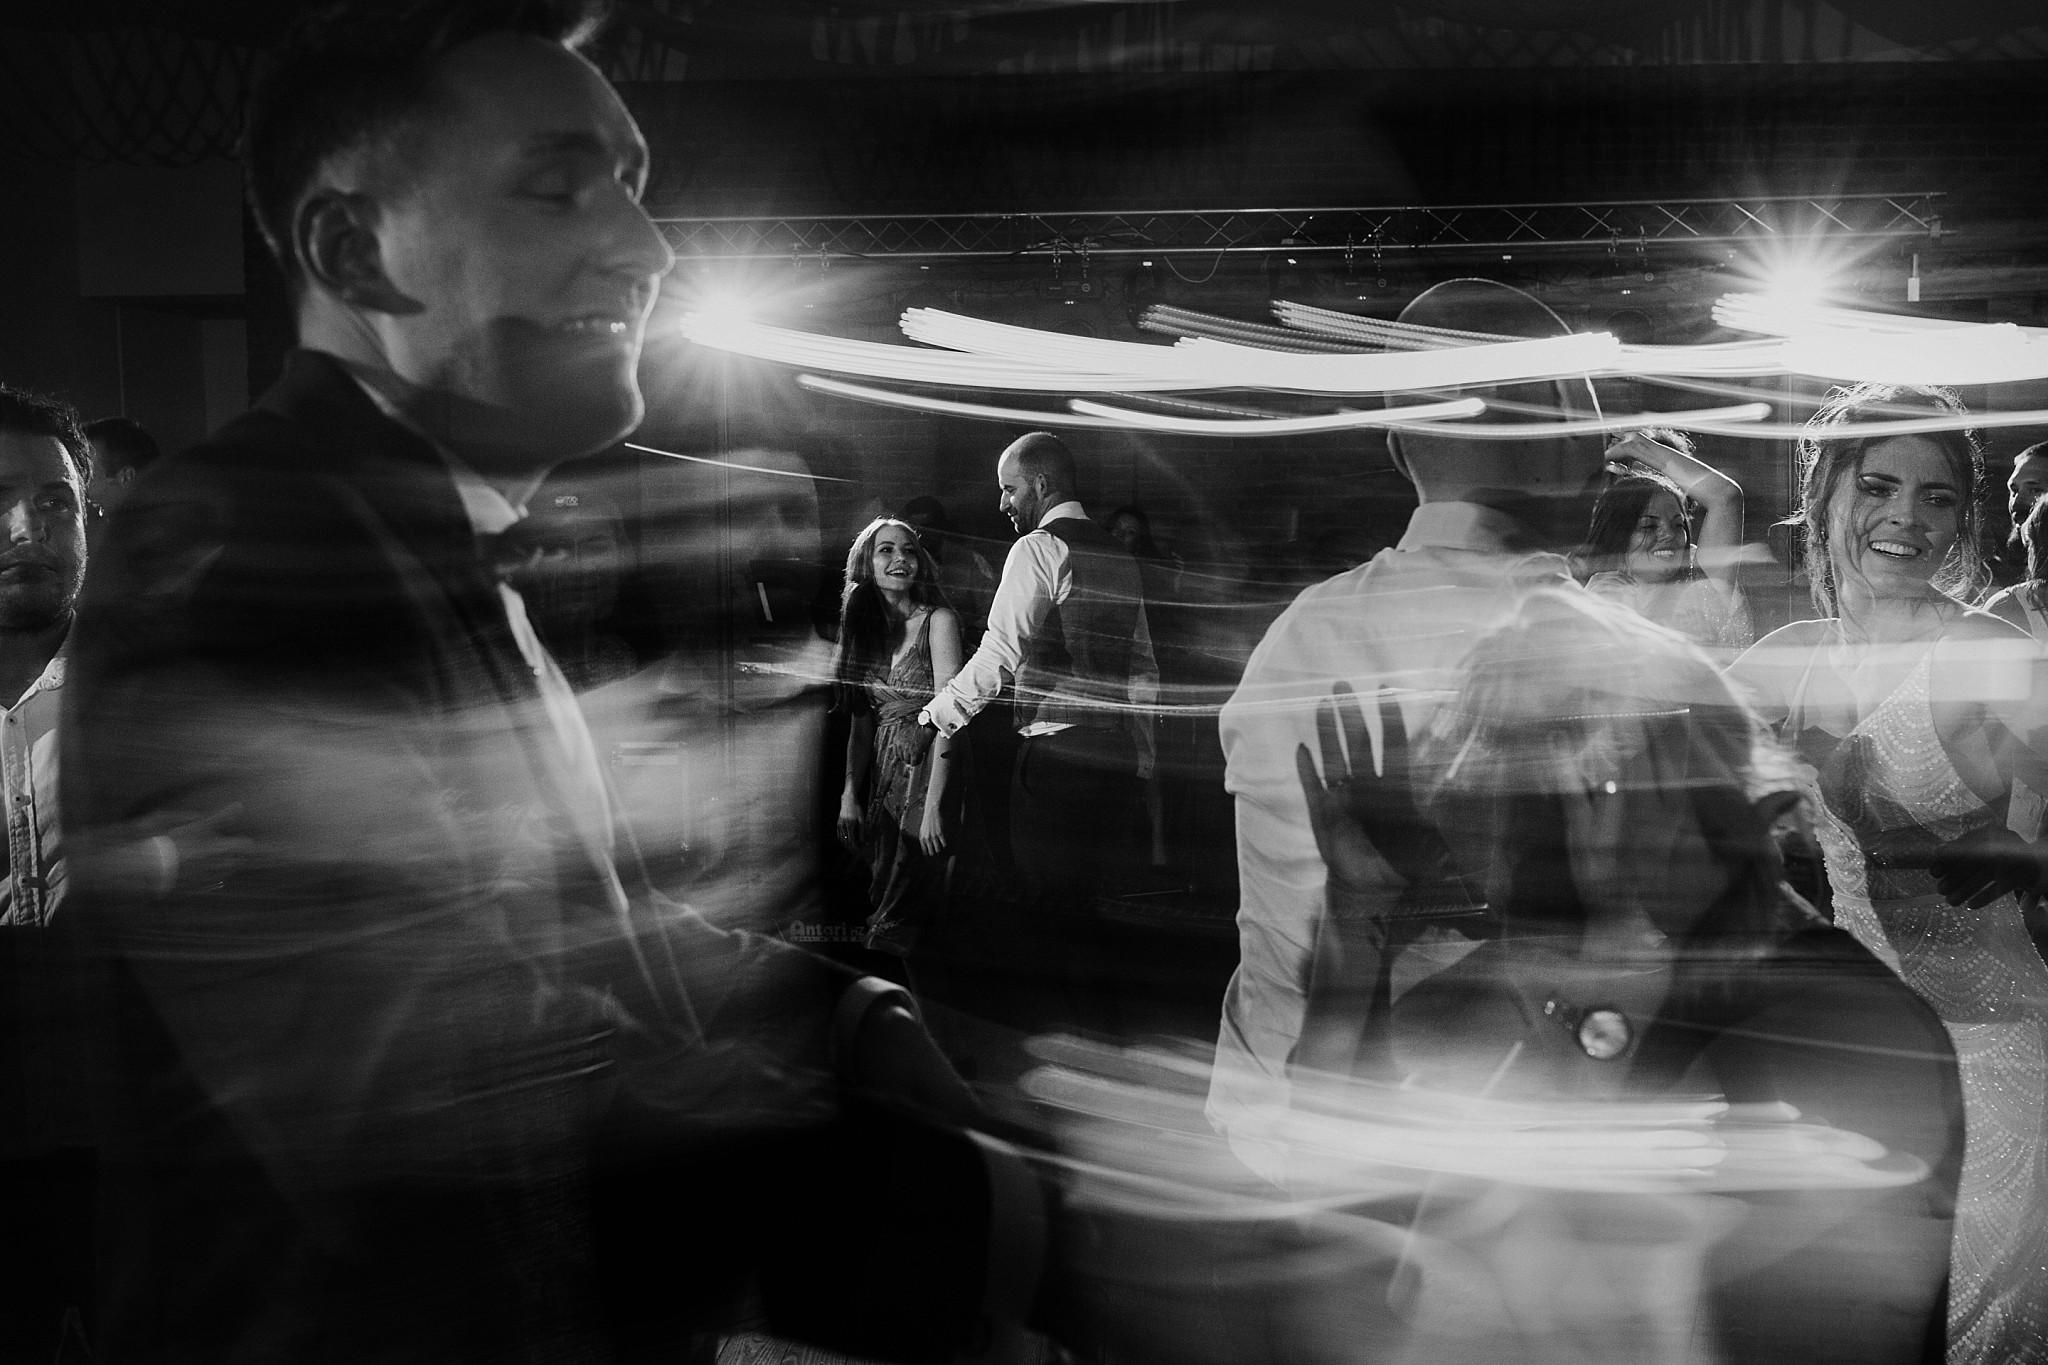 fotograf poznan wesele dobra truskawka piekne wesele pod poznaniem wesele w dobrej truskawce piekna para mloda slub marzen slub koronawirus slub listopad wesele koronawirus 473